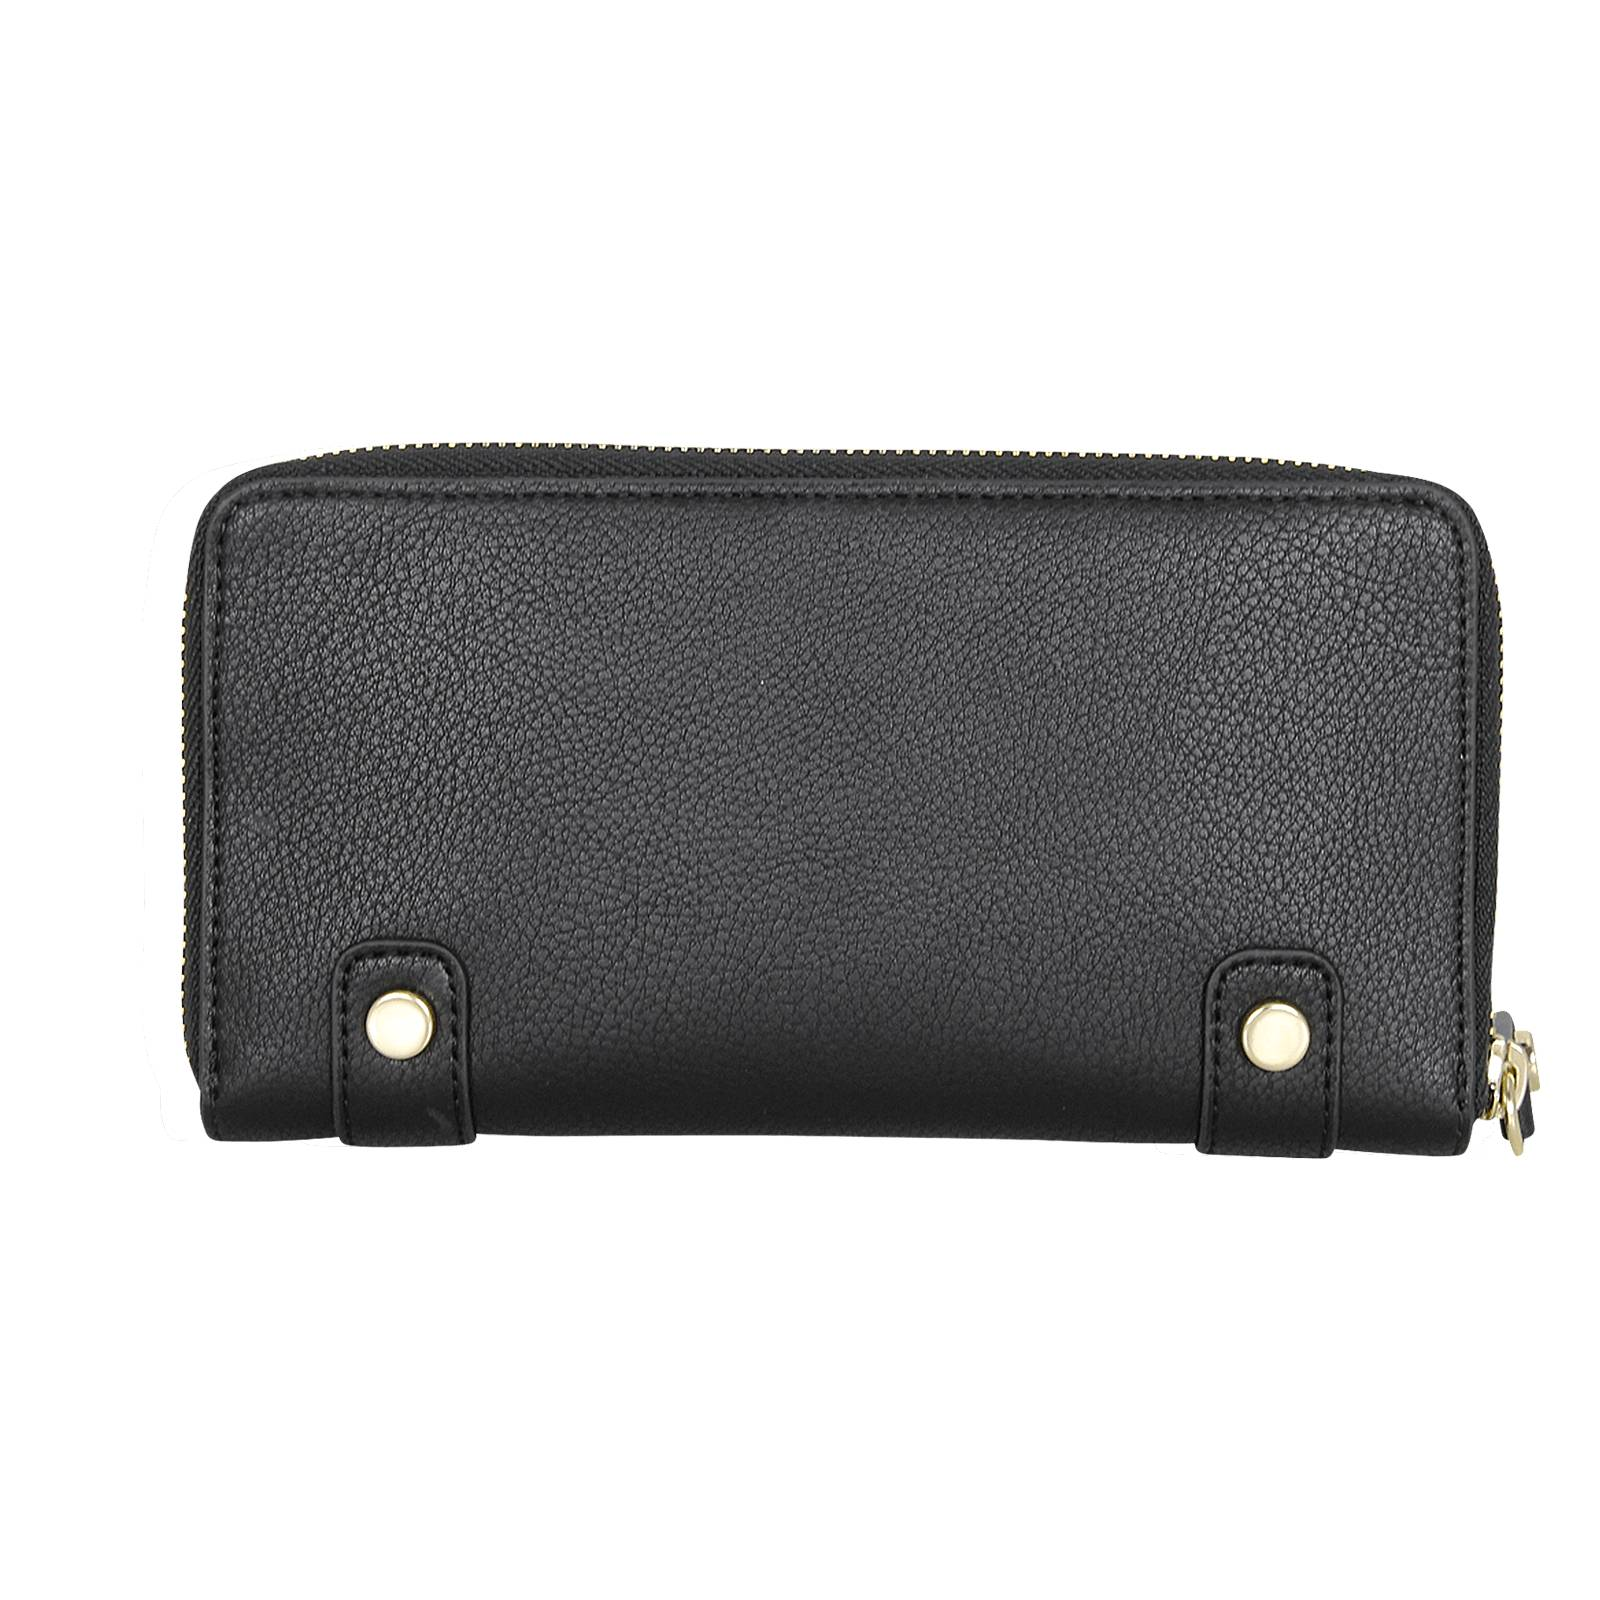 a0a83f7d88 Tommy Chain Za Wallet - Γυναικείο πορτοφόλι Tommy Hilfiger από δερμα ...